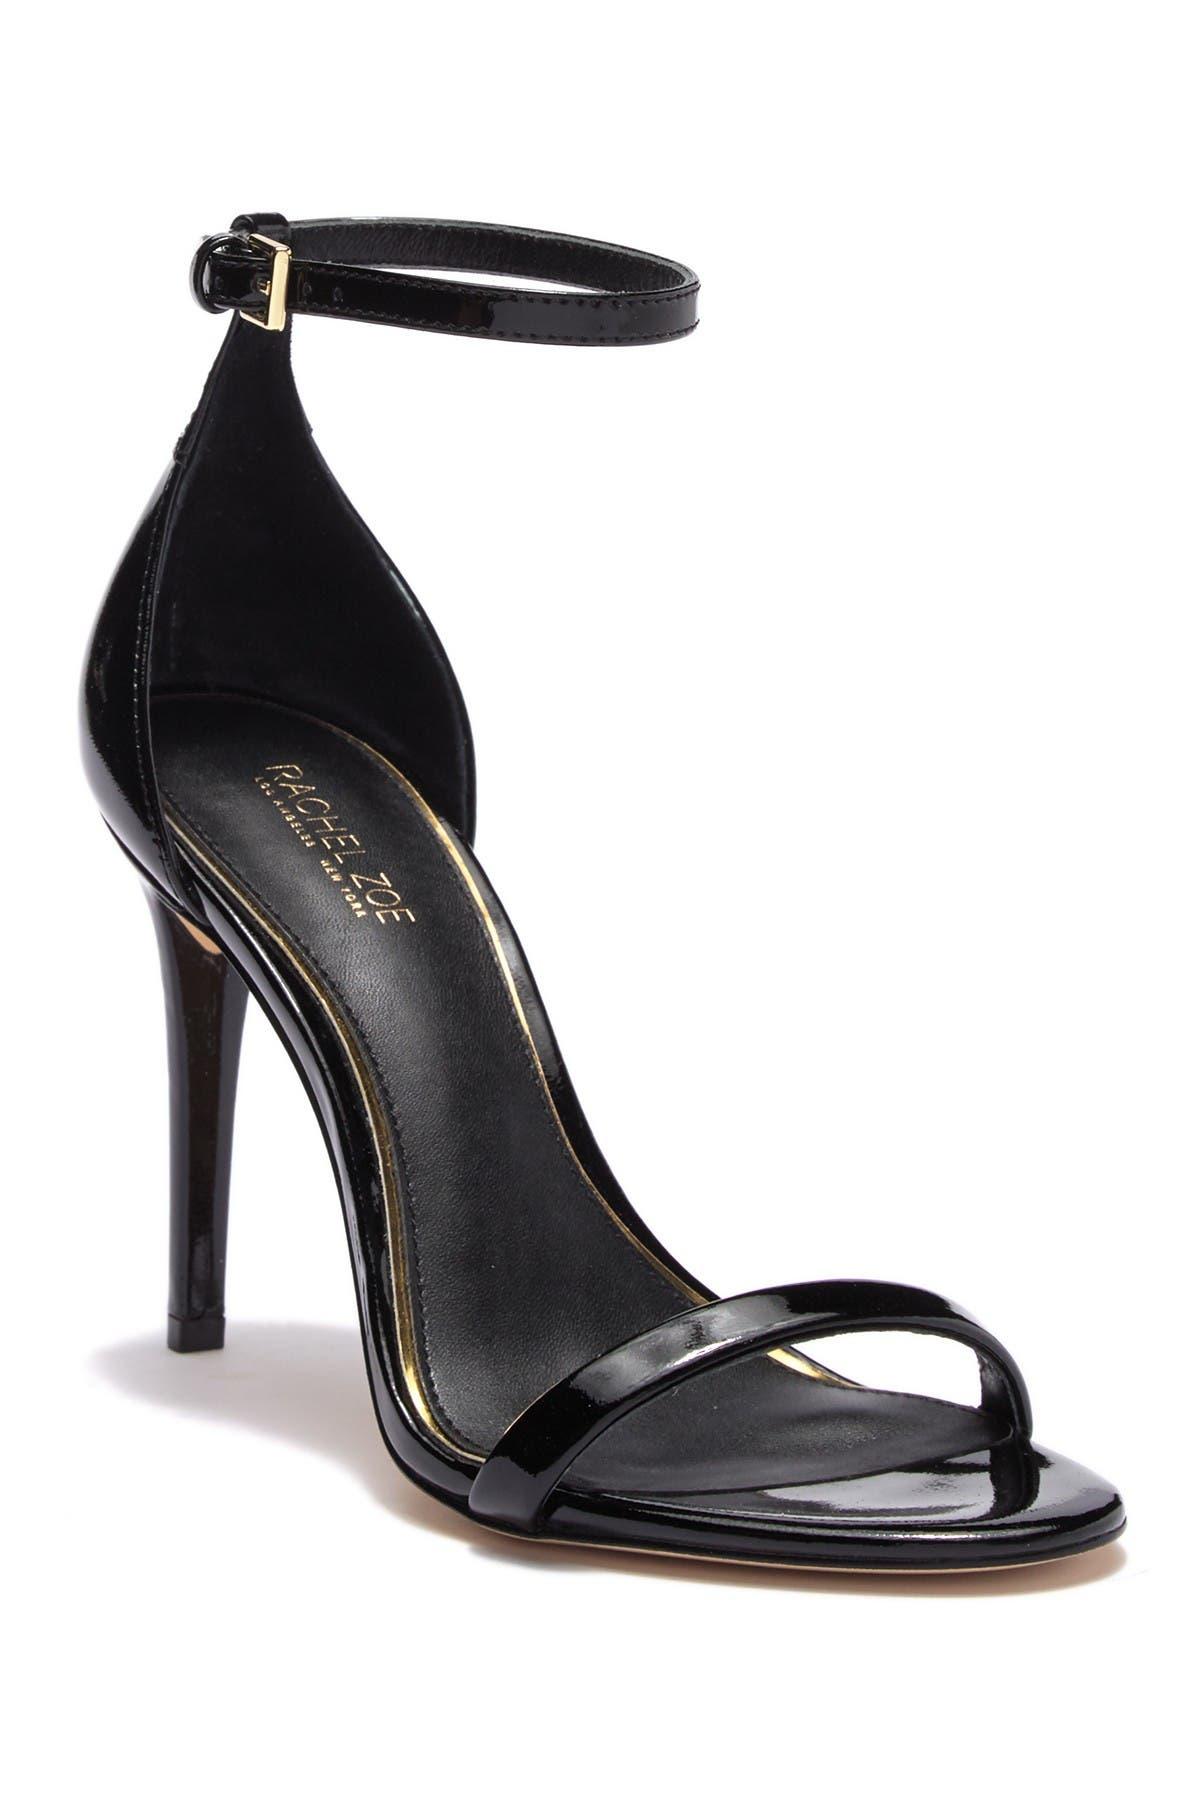 Image of Rachel Zoe Ema Patent Leather Stiletto Sandal